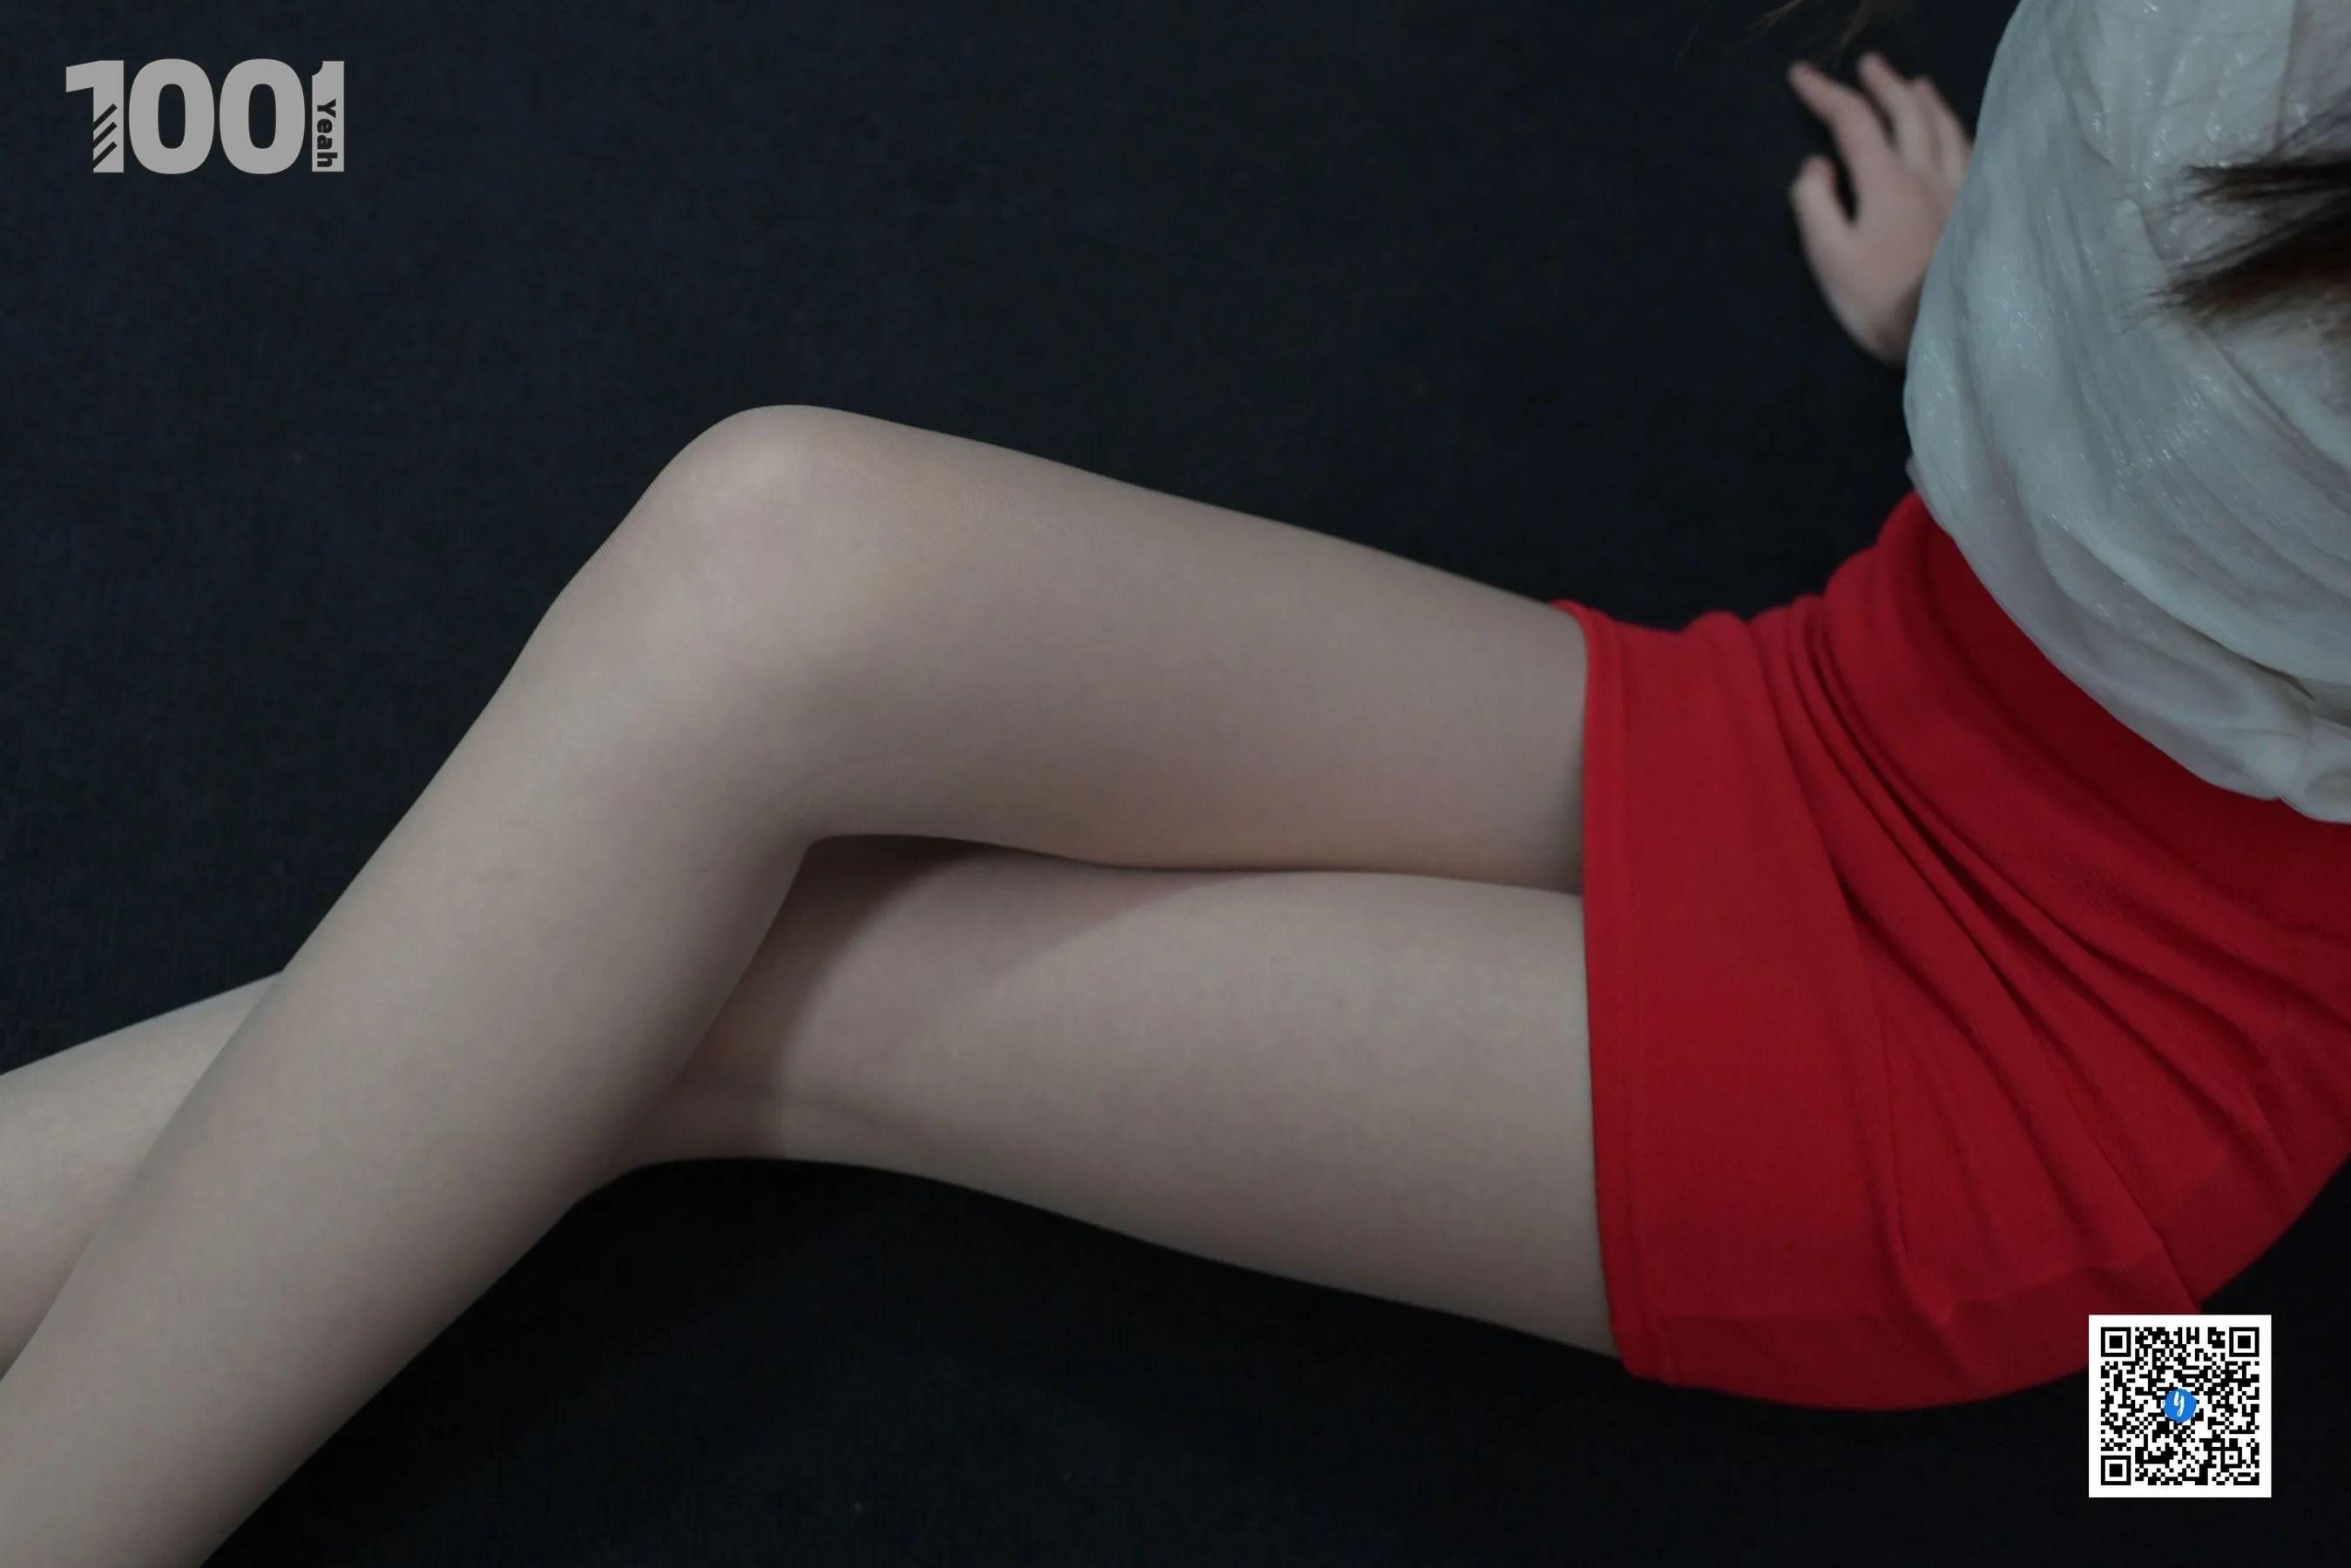 [IESS] NO.190 【一抹红】完结篇  丝足美腿写真[90P]插图(2)